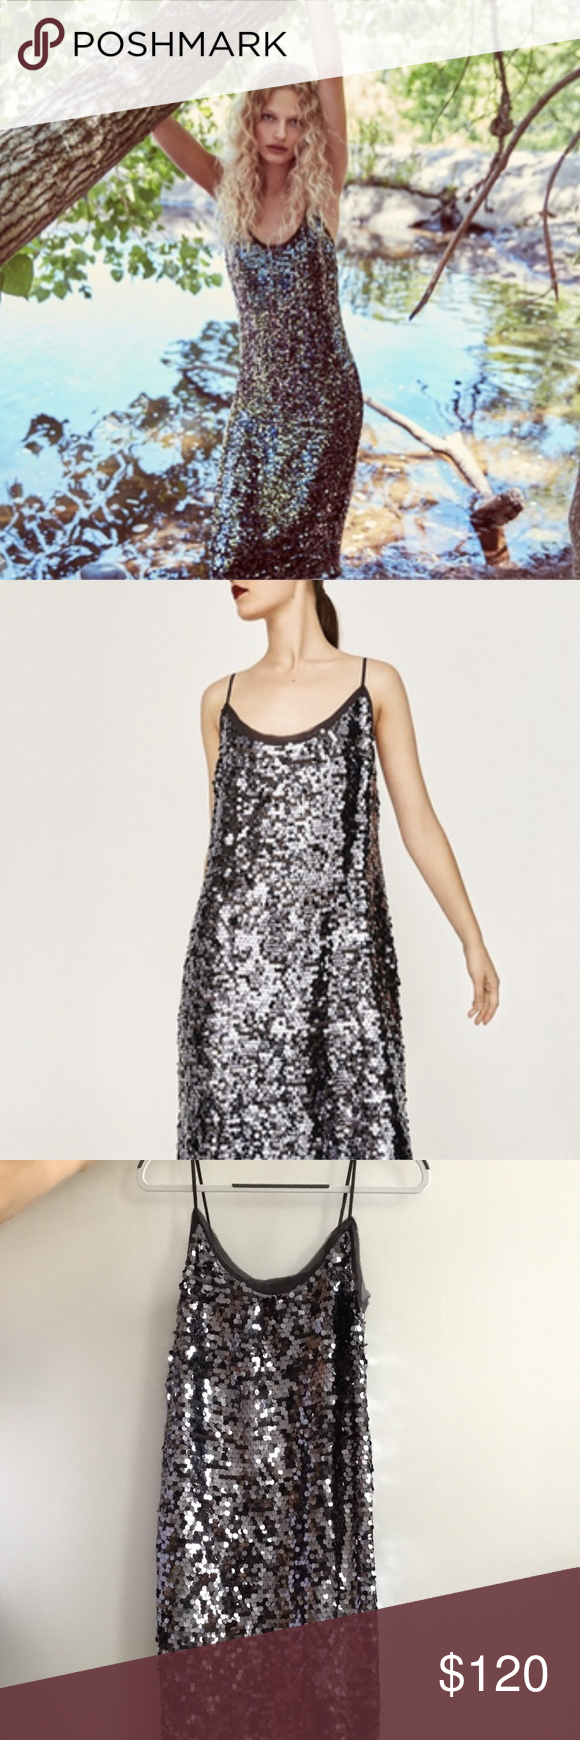 4f071ecf NWT | Zara Disco Forest Dress NWT, Zara Woman Disco Forest sequin slip dress  (taupe / gunmetal) Size Medium/Large Zara Dresses